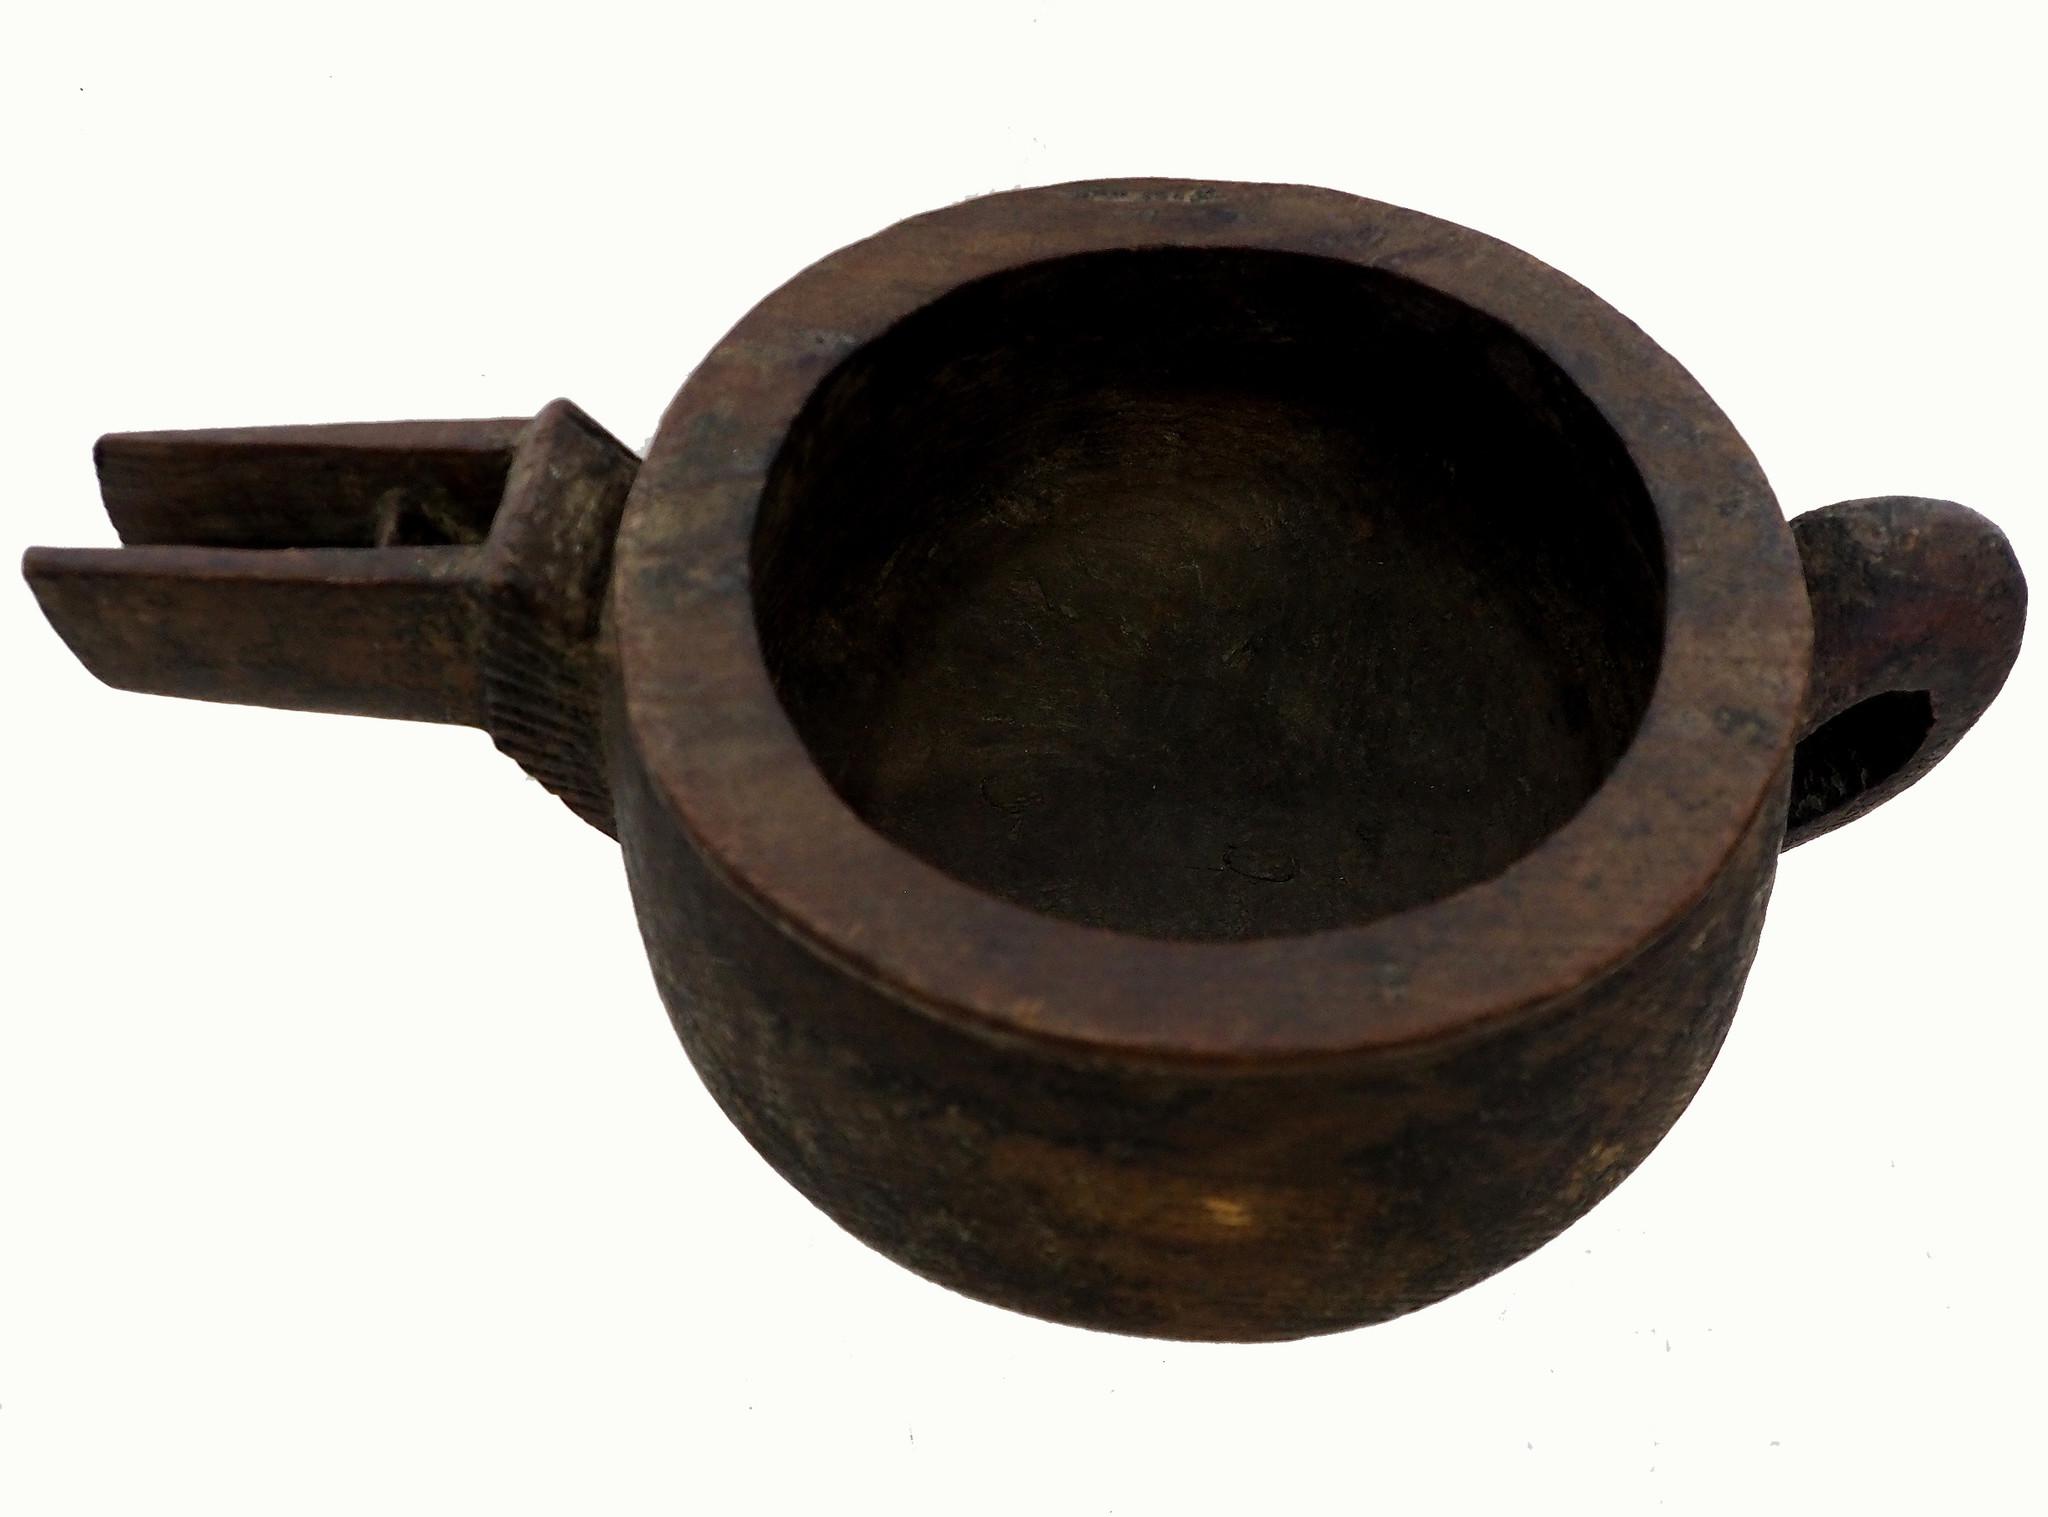 Antique wooden bowl  Nuristan Afghanistan No:19/4